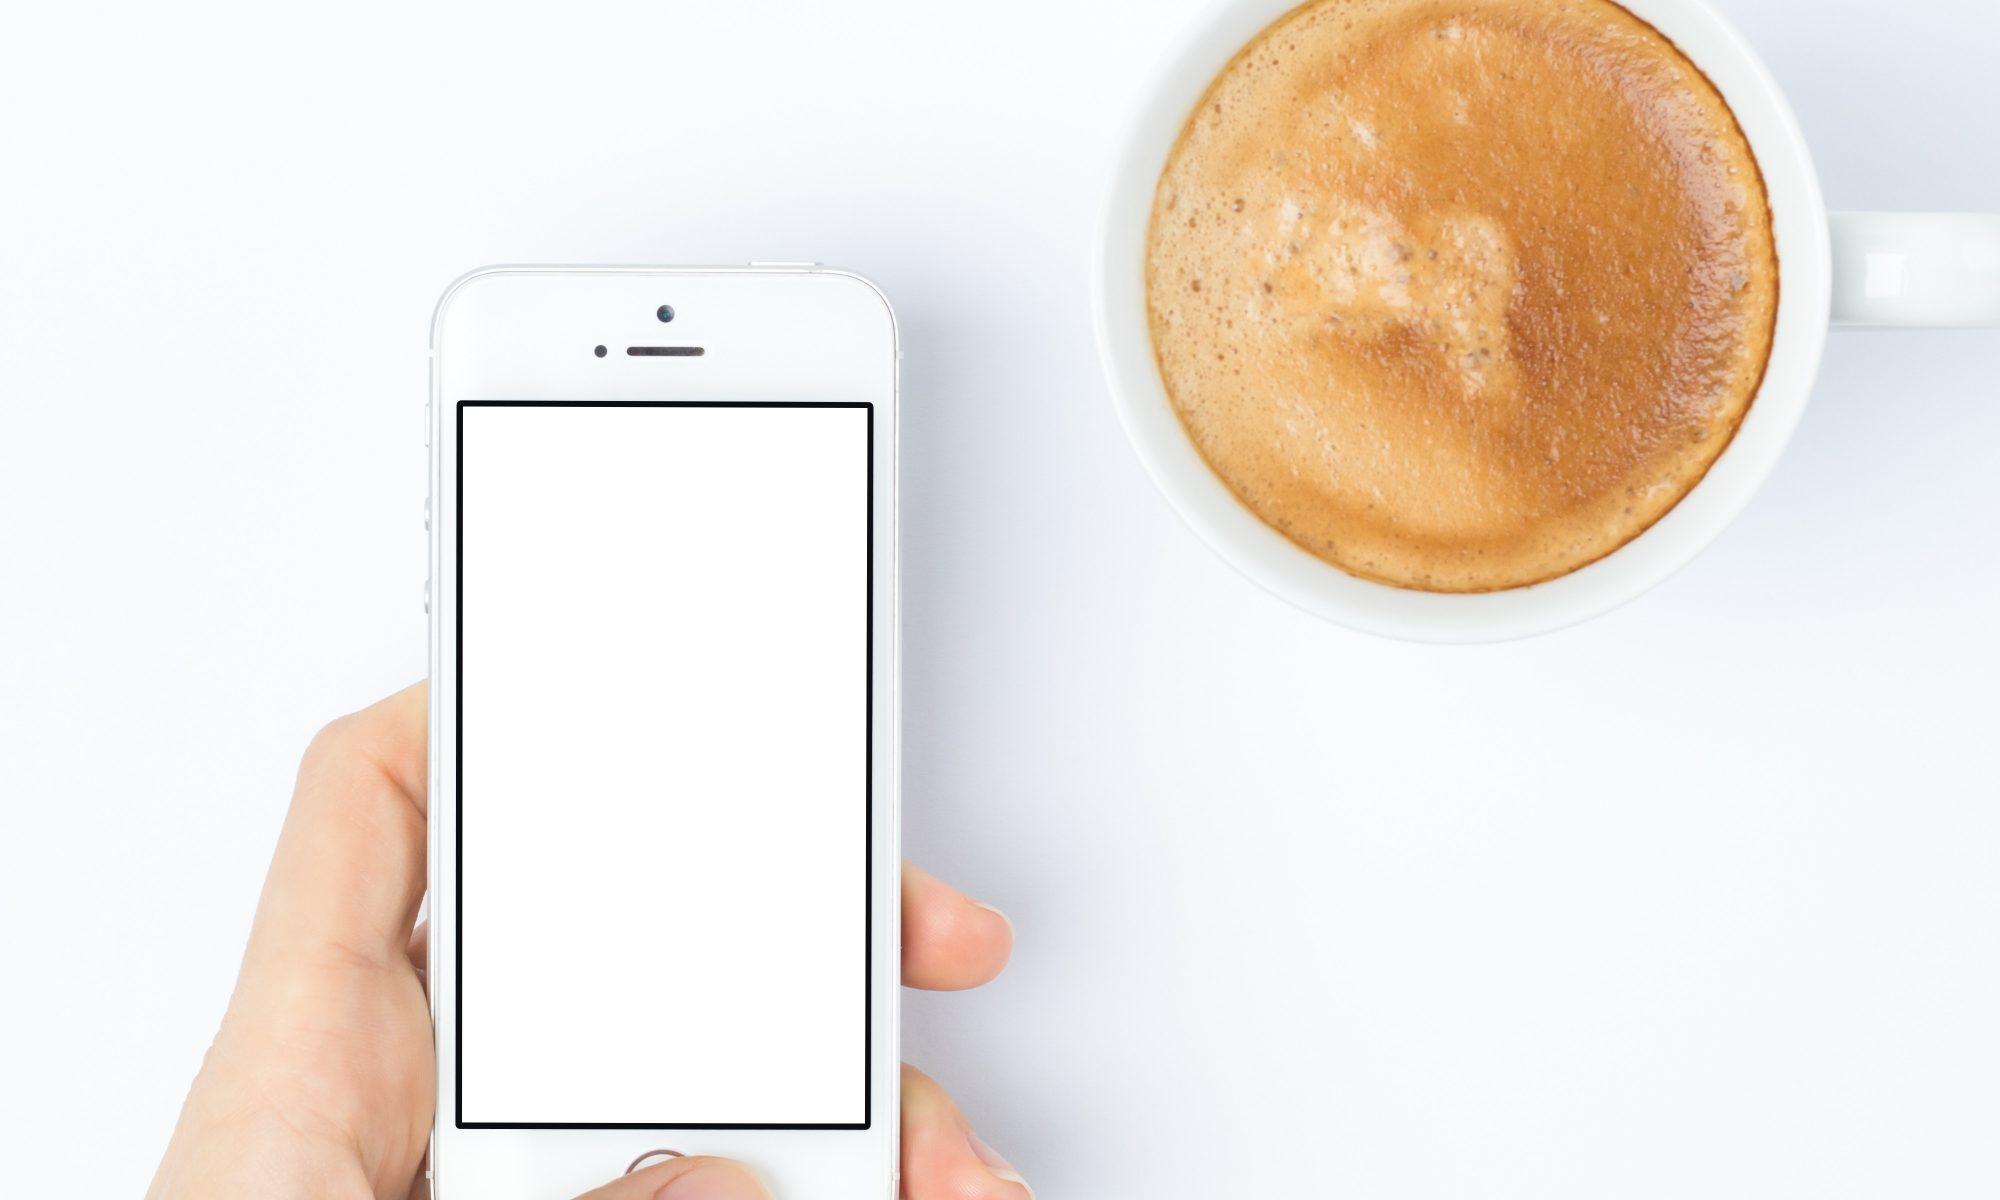 Billige og praktiske mobil covers beskytter din telefon mod splintring